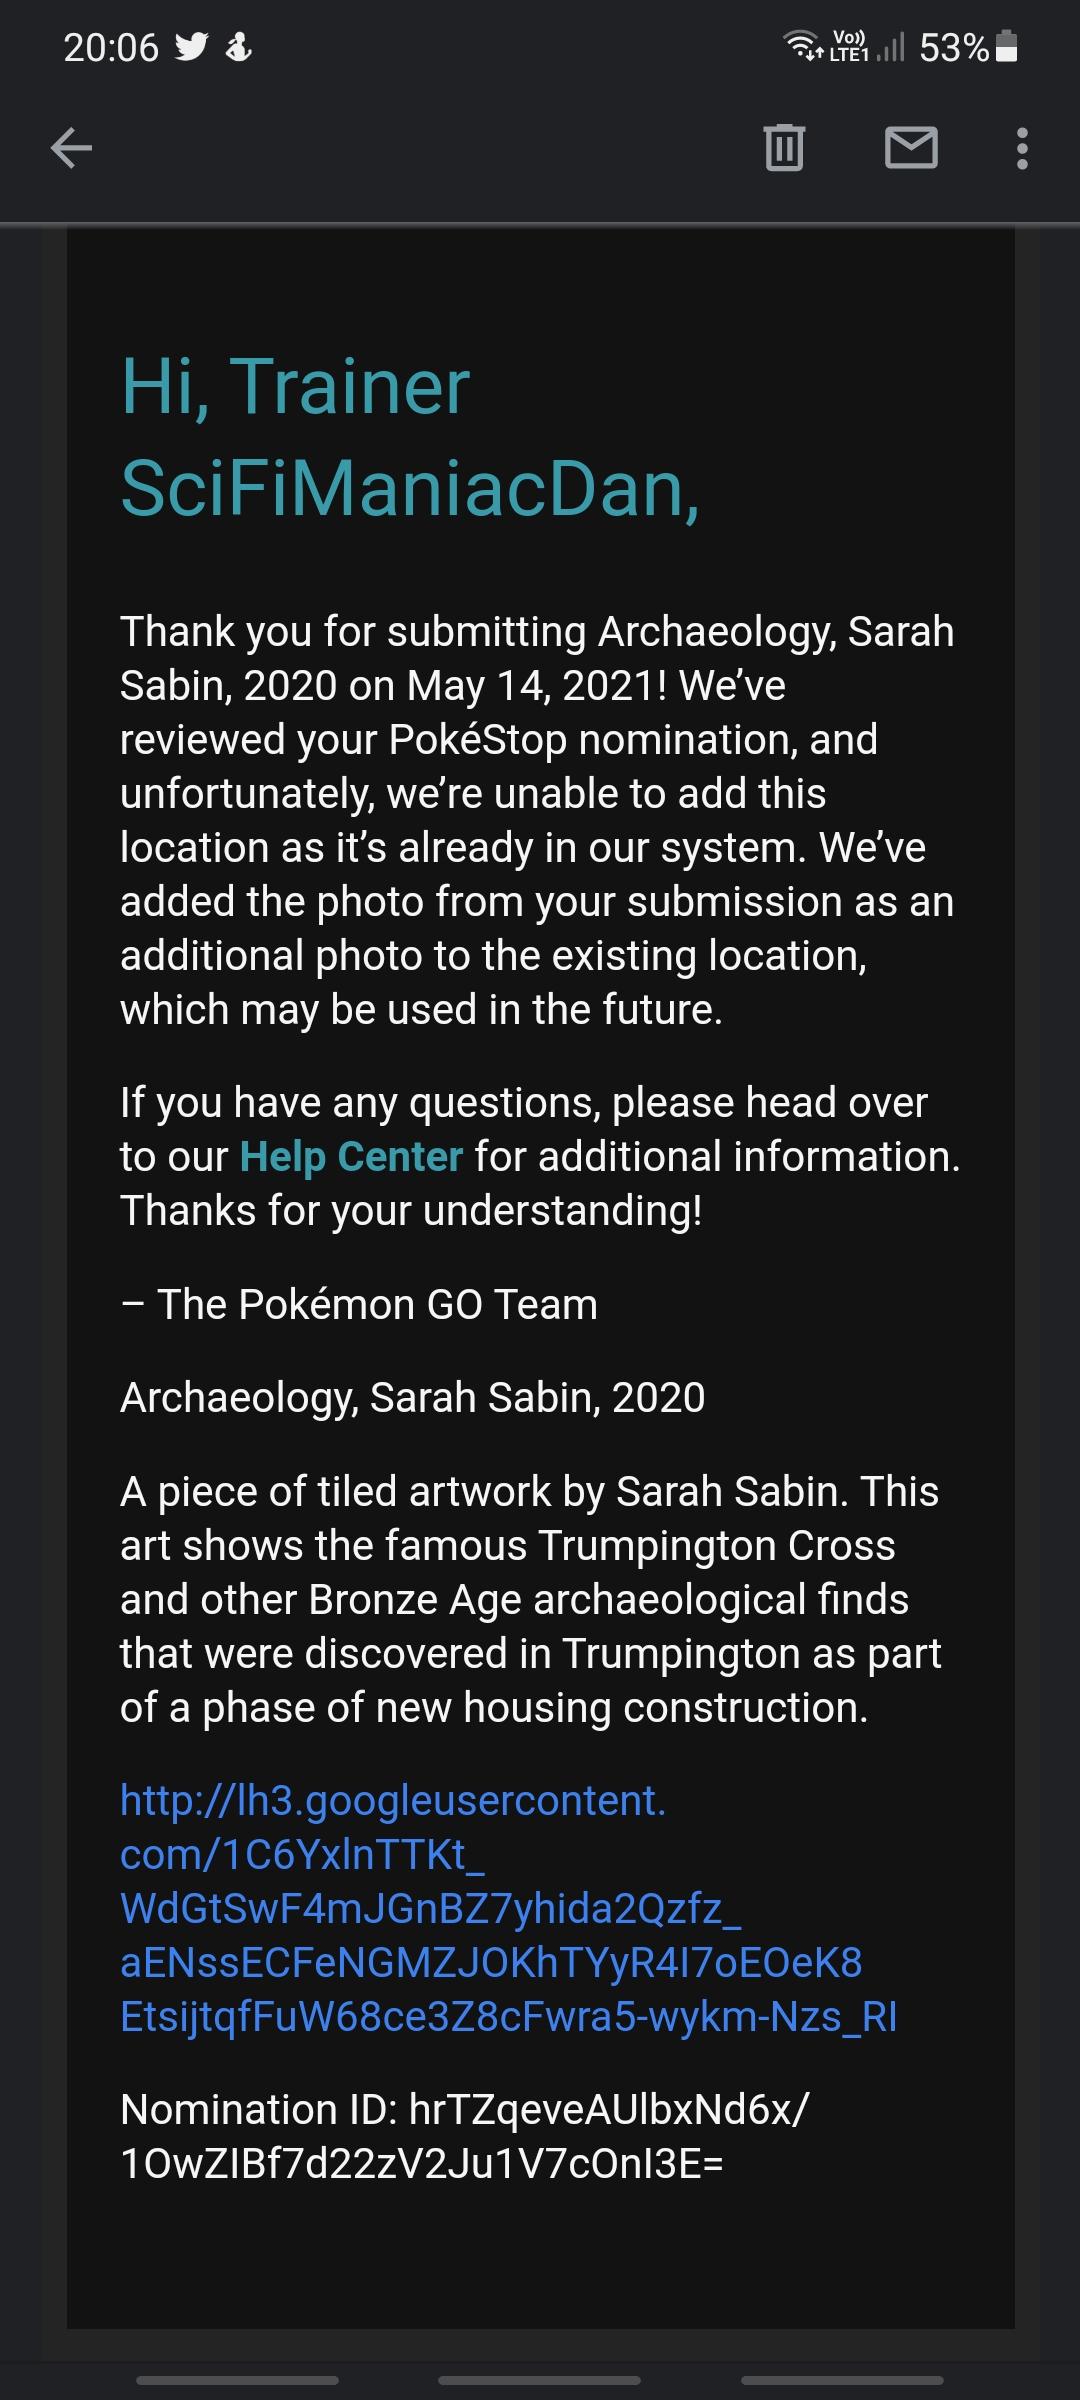 screenshot-20210530-200653-gmail.jpg